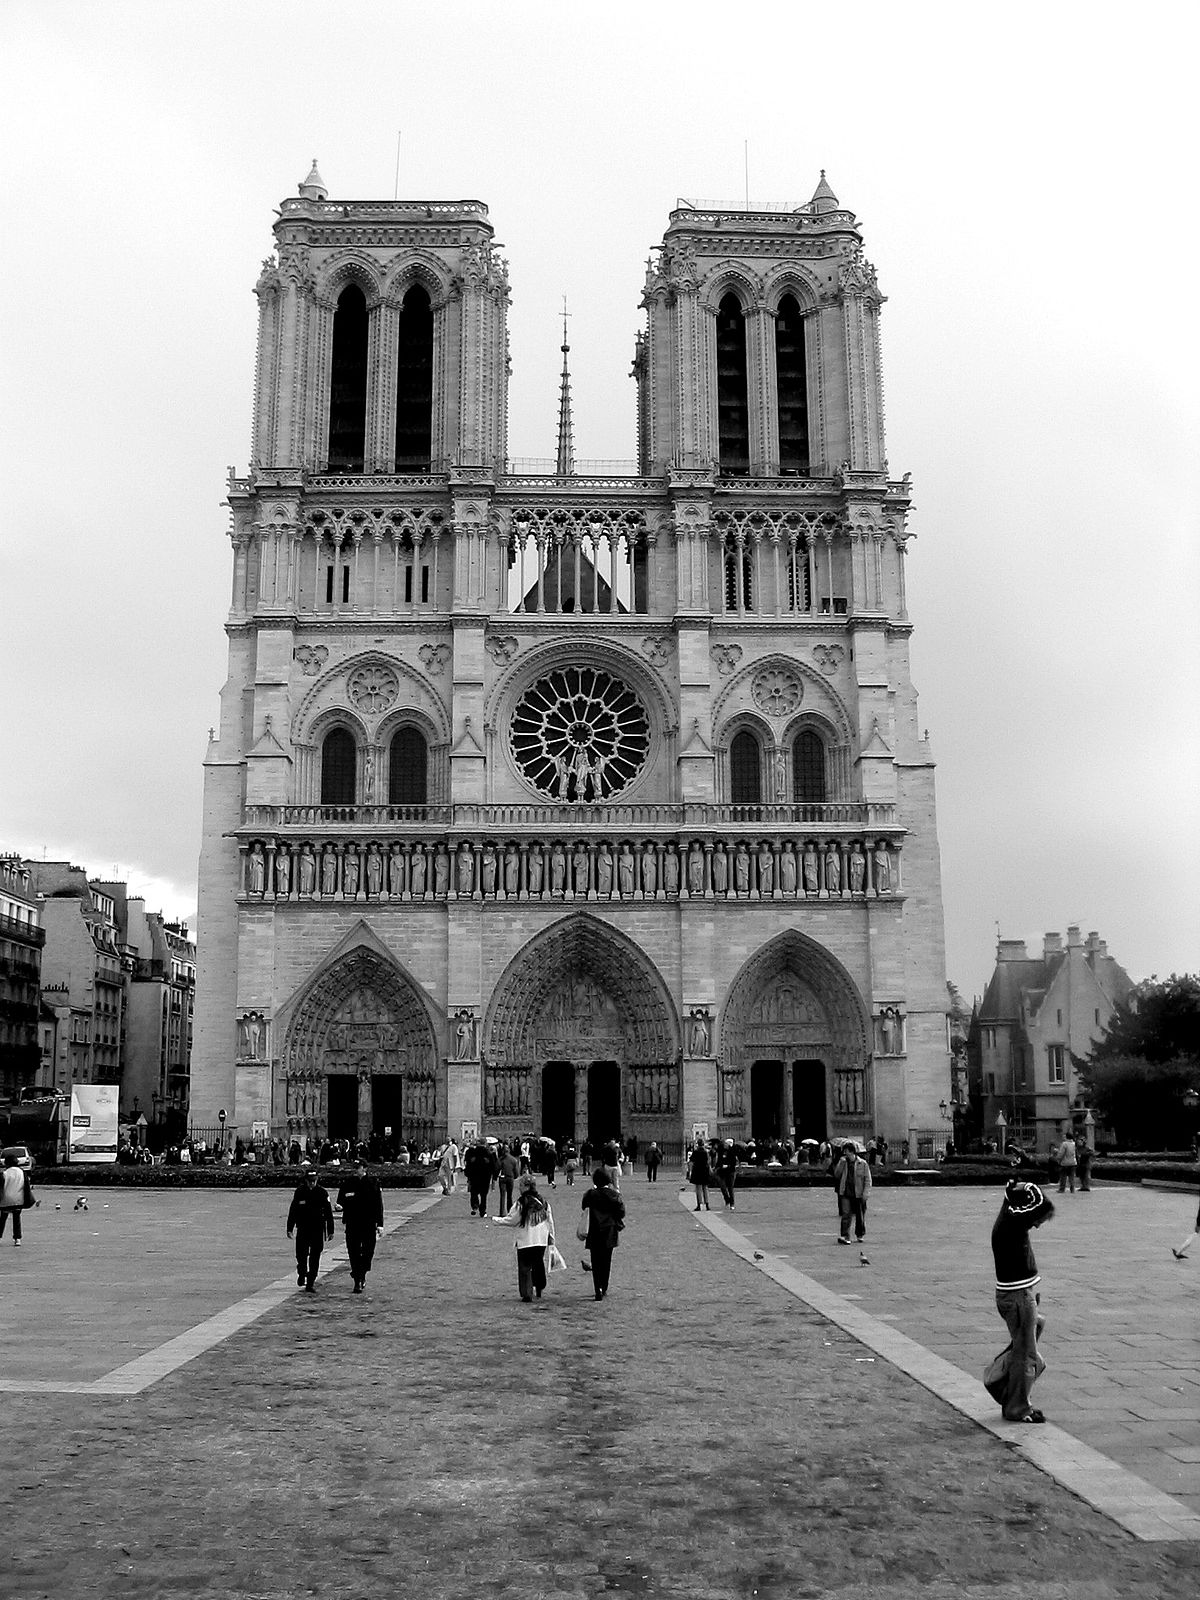 1200px-Notre_dame_de_paris_en_octobre_2006.jpg